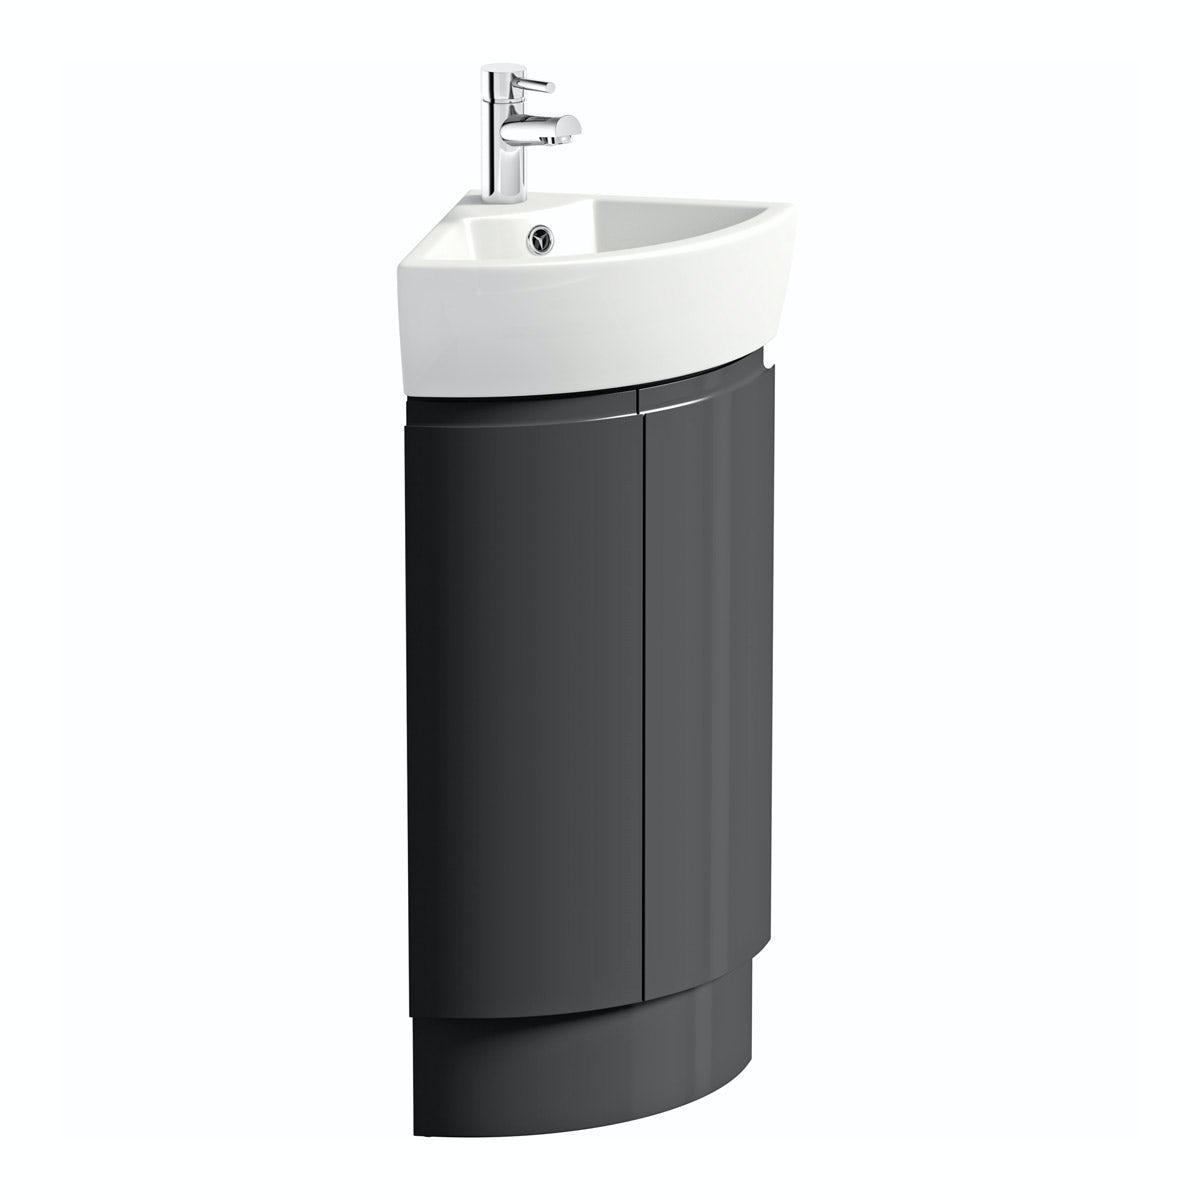 Mode Harrison slate corner vanity unit and basin